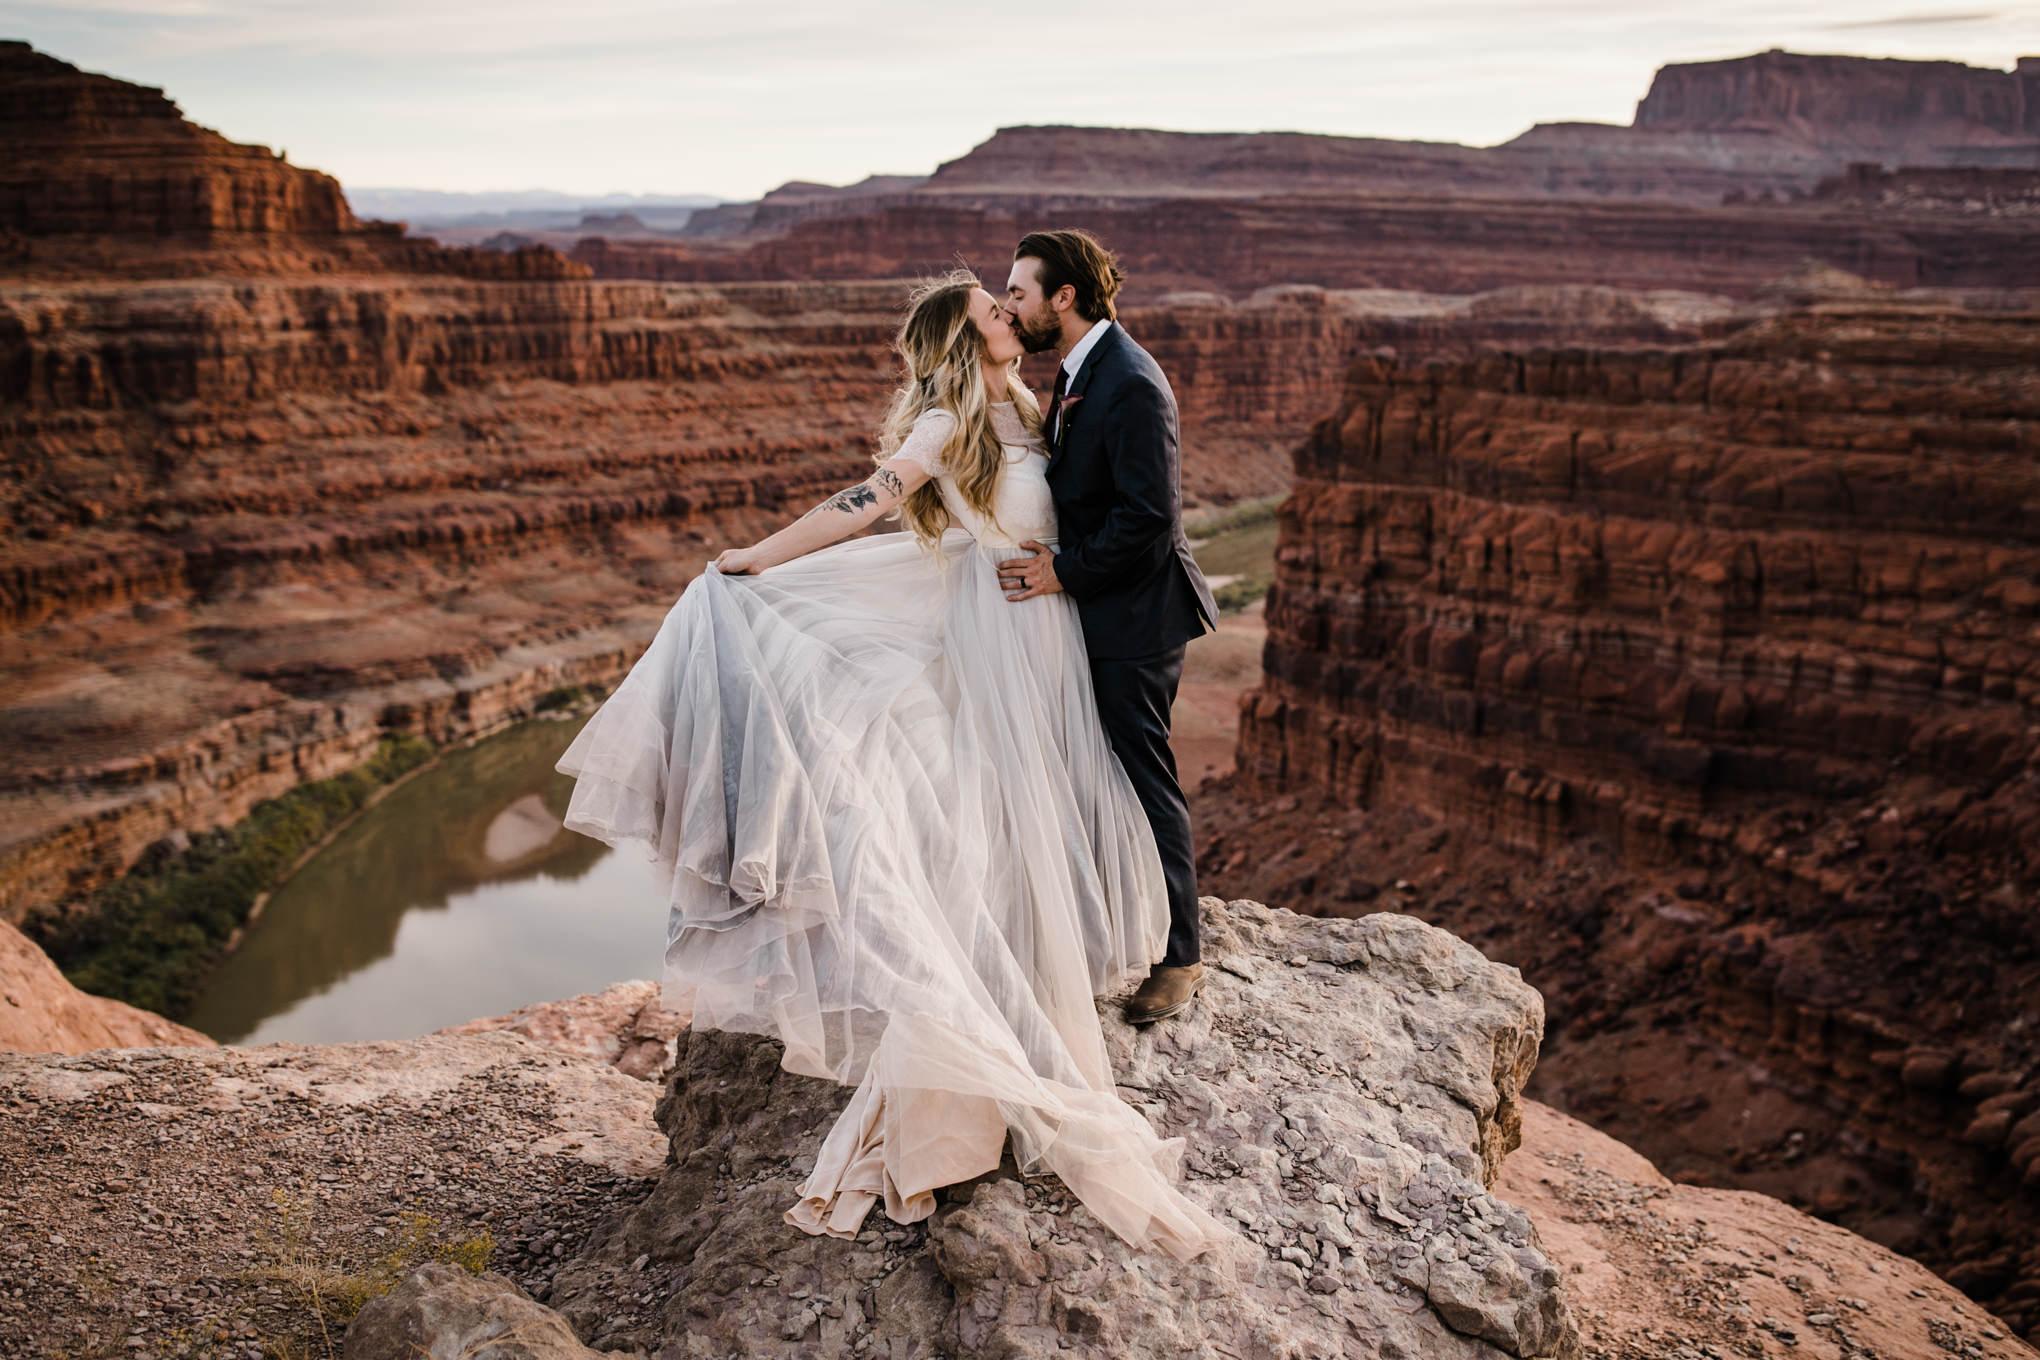 Jeep-Elopement-Moab-Adventure-Wedding-Photographer-Utah-4.jpg